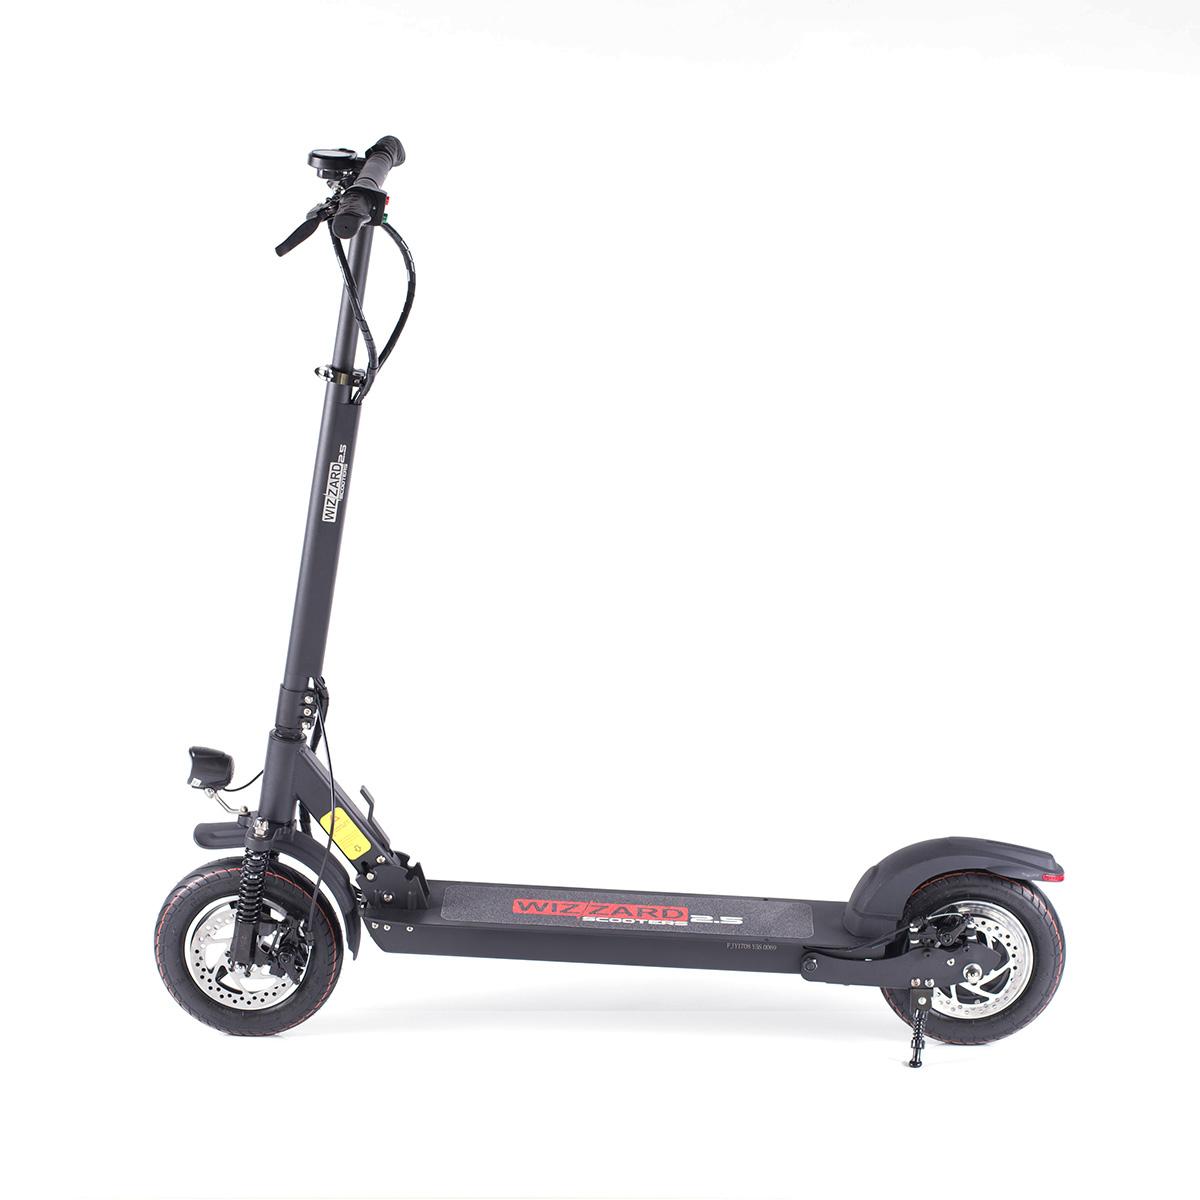 elektro city scooter elektroroller wizzard 2 5 schnellste e scootermonowheel hersteller f r. Black Bedroom Furniture Sets. Home Design Ideas